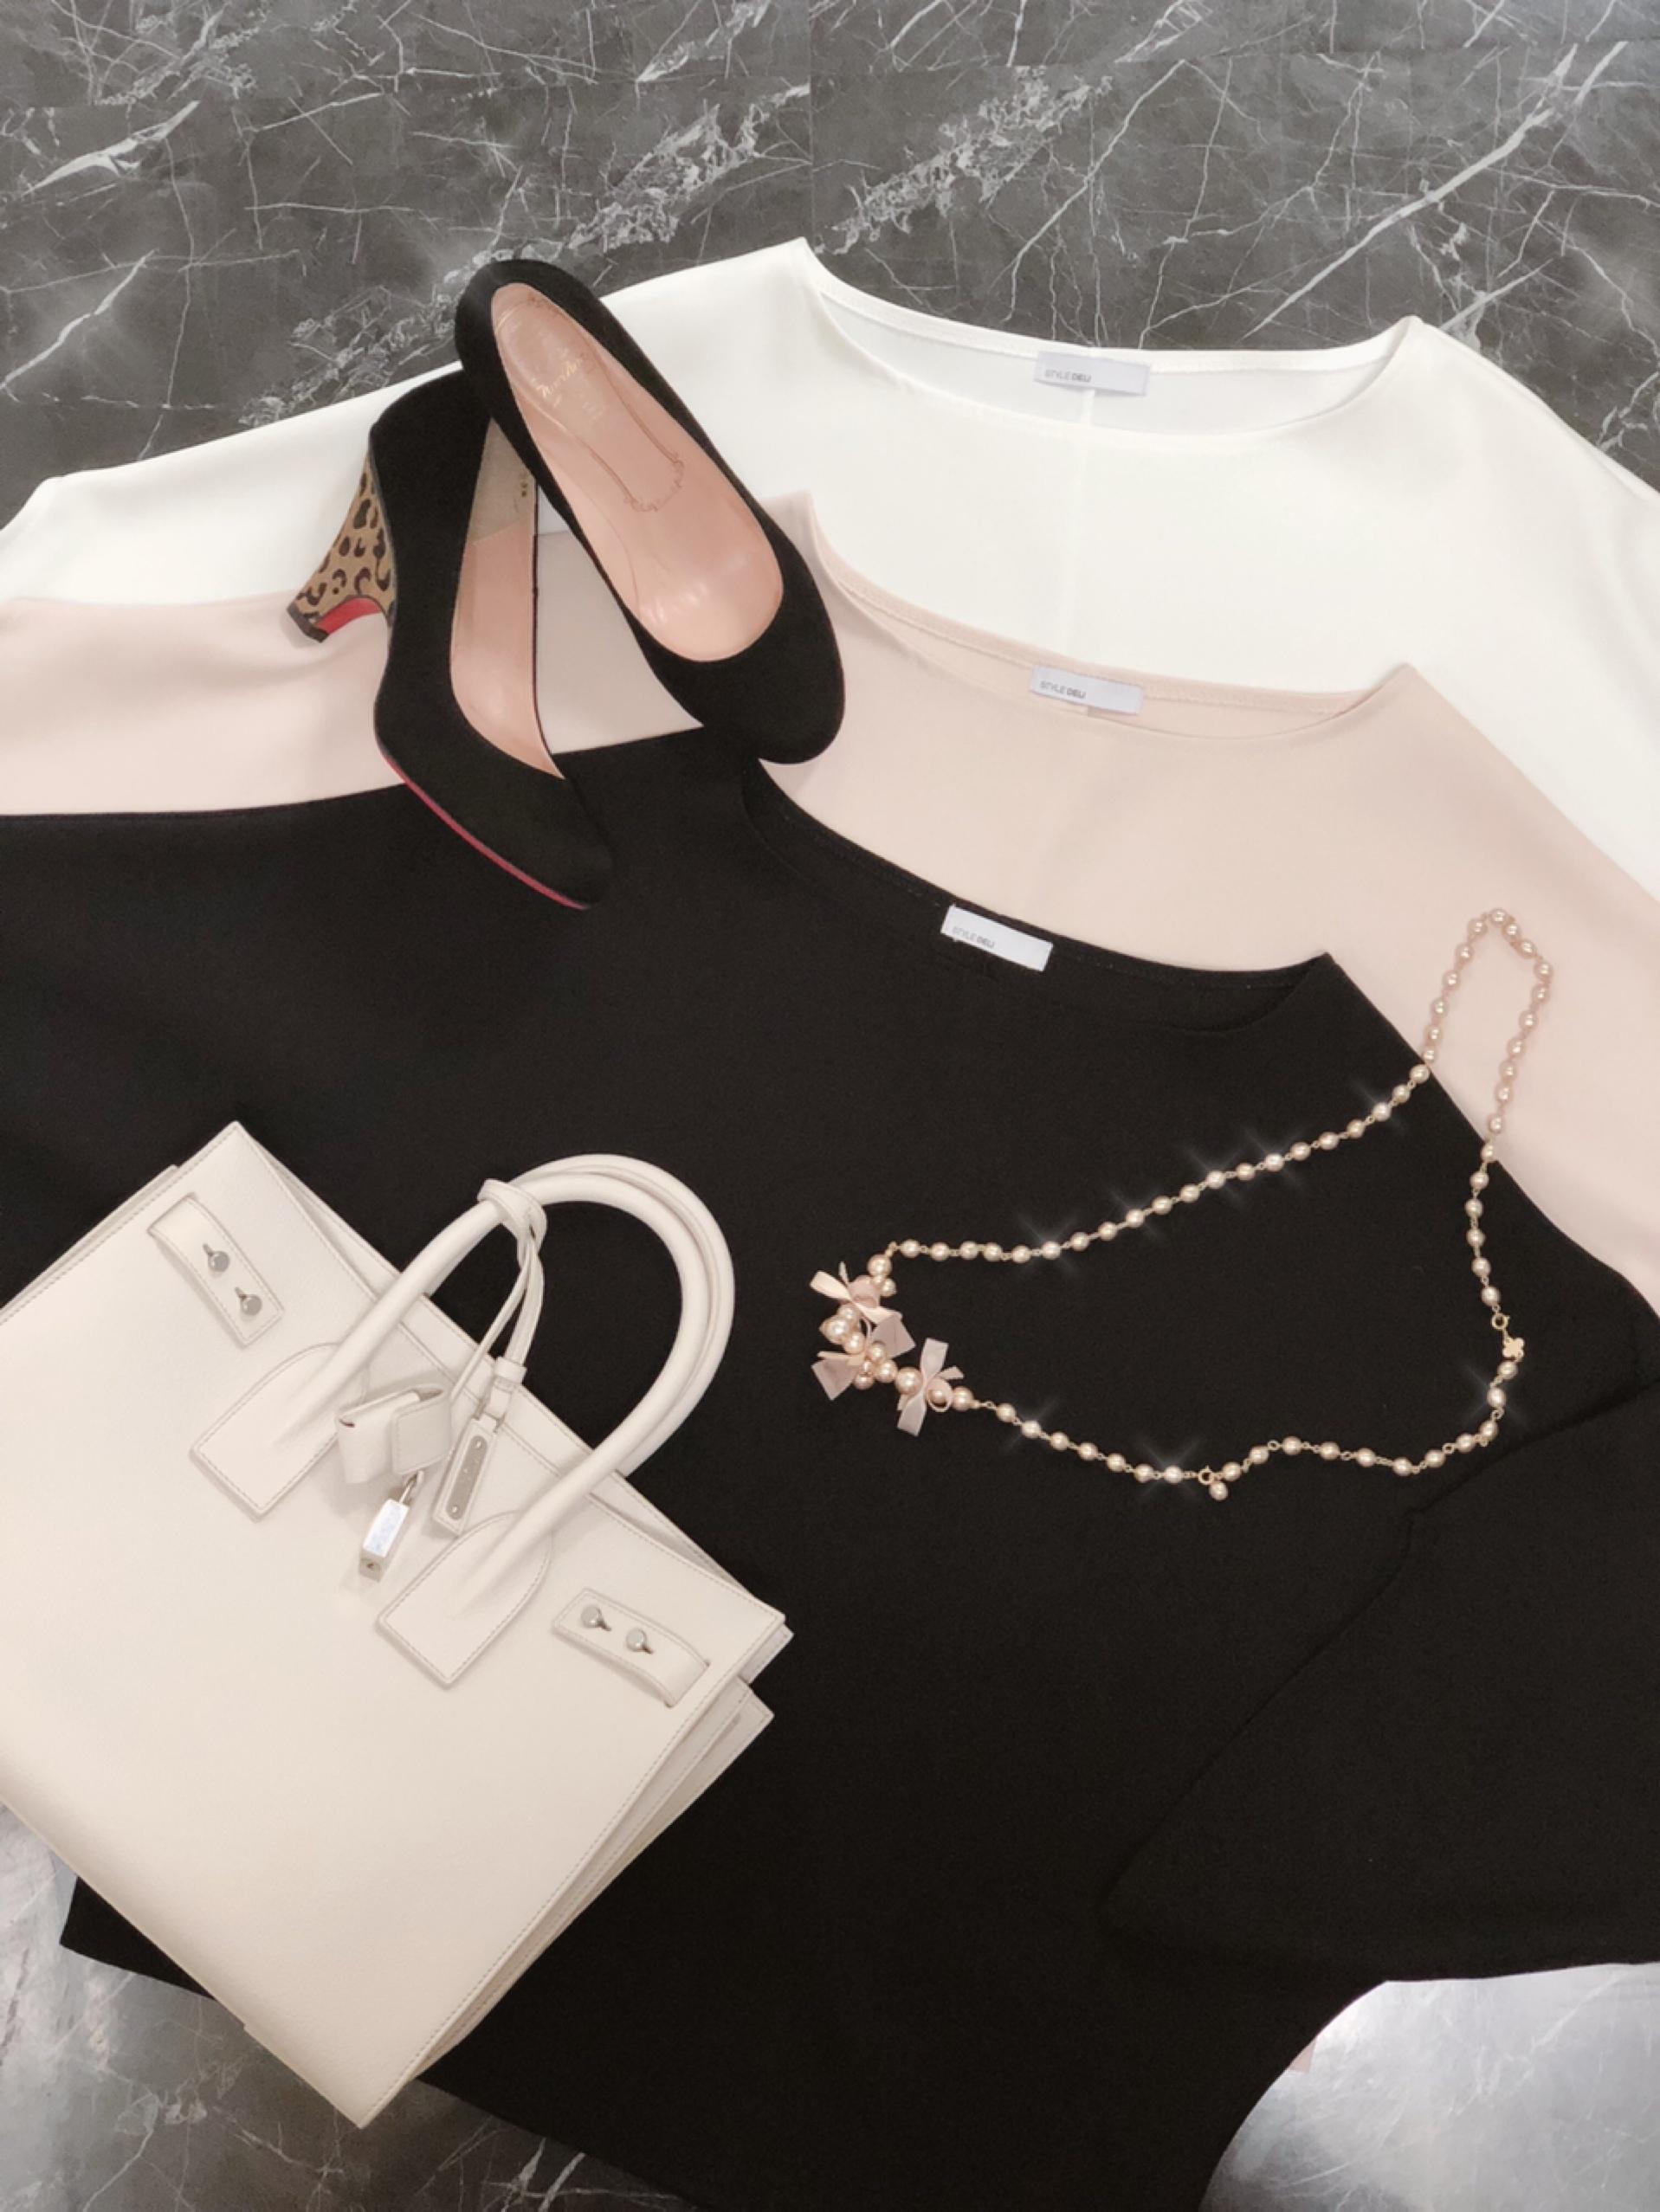 tops : STYLE DELI shoes : kariAng bag : YSL